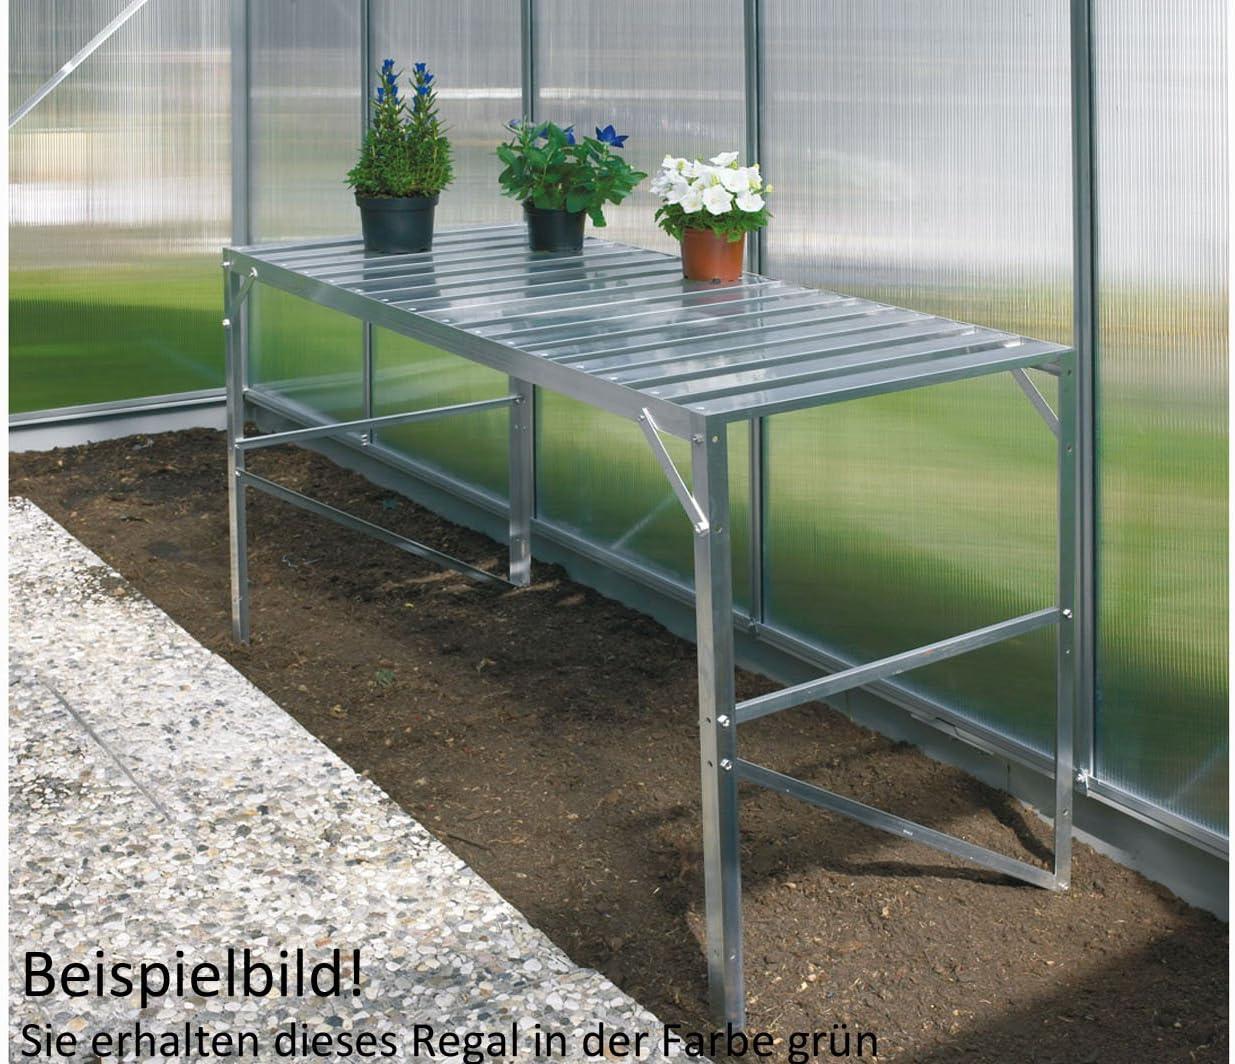 Vitavia Mesa 1 Bandeja de Aluminio Lacado Verde Abeto, L 120 x 54 x Altura 76 cm.: Amazon.es: Jardín